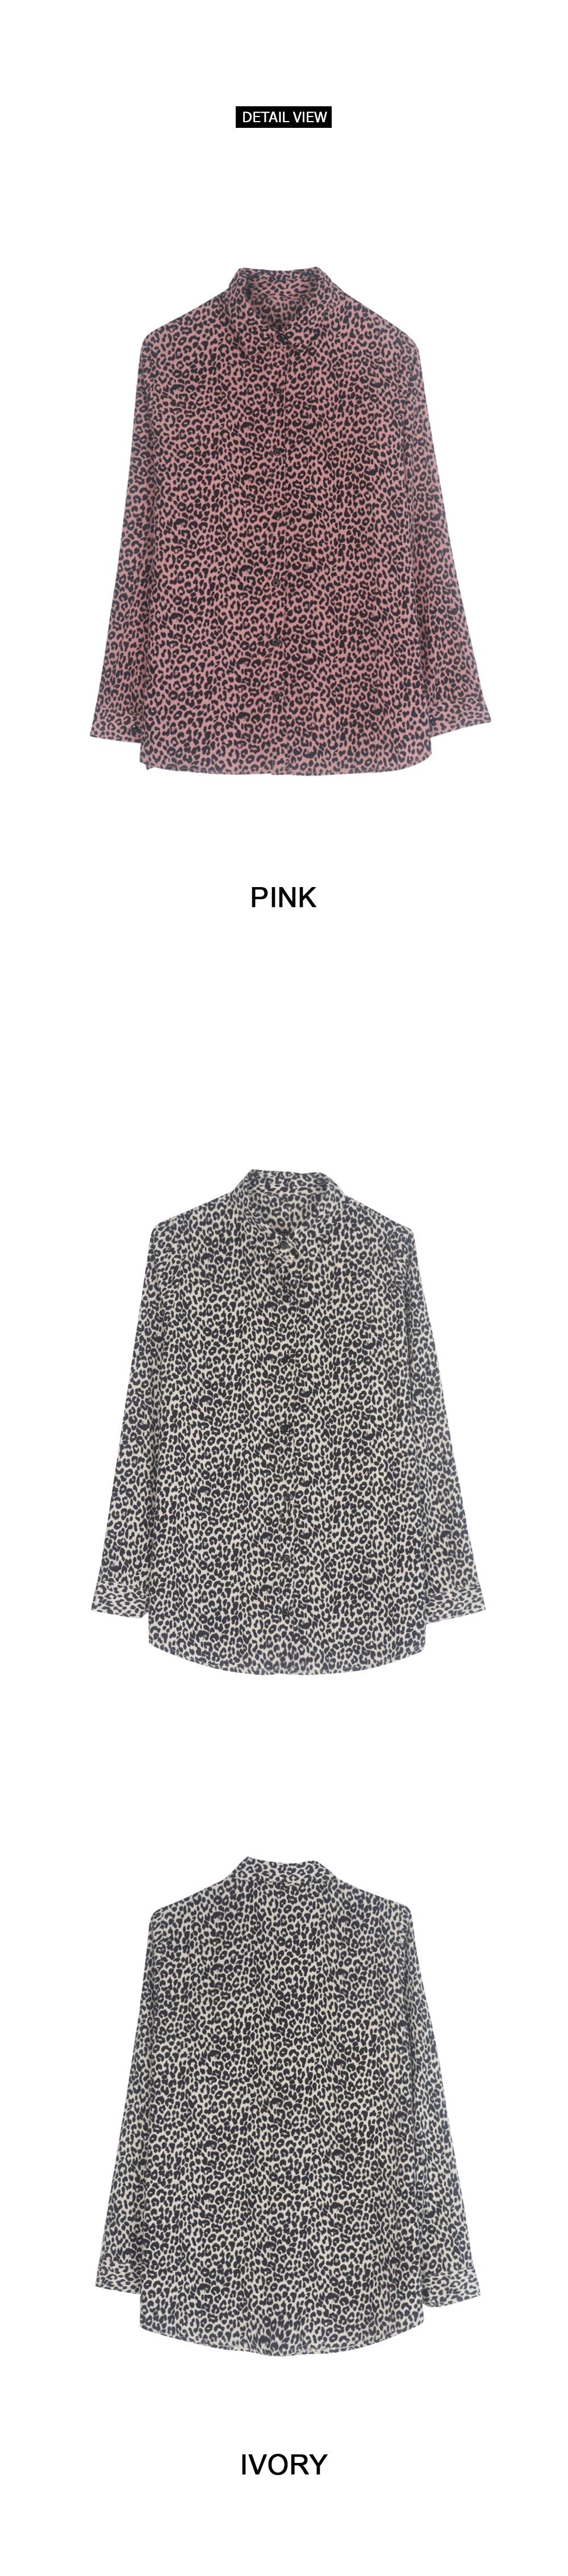 Leopard open blouse